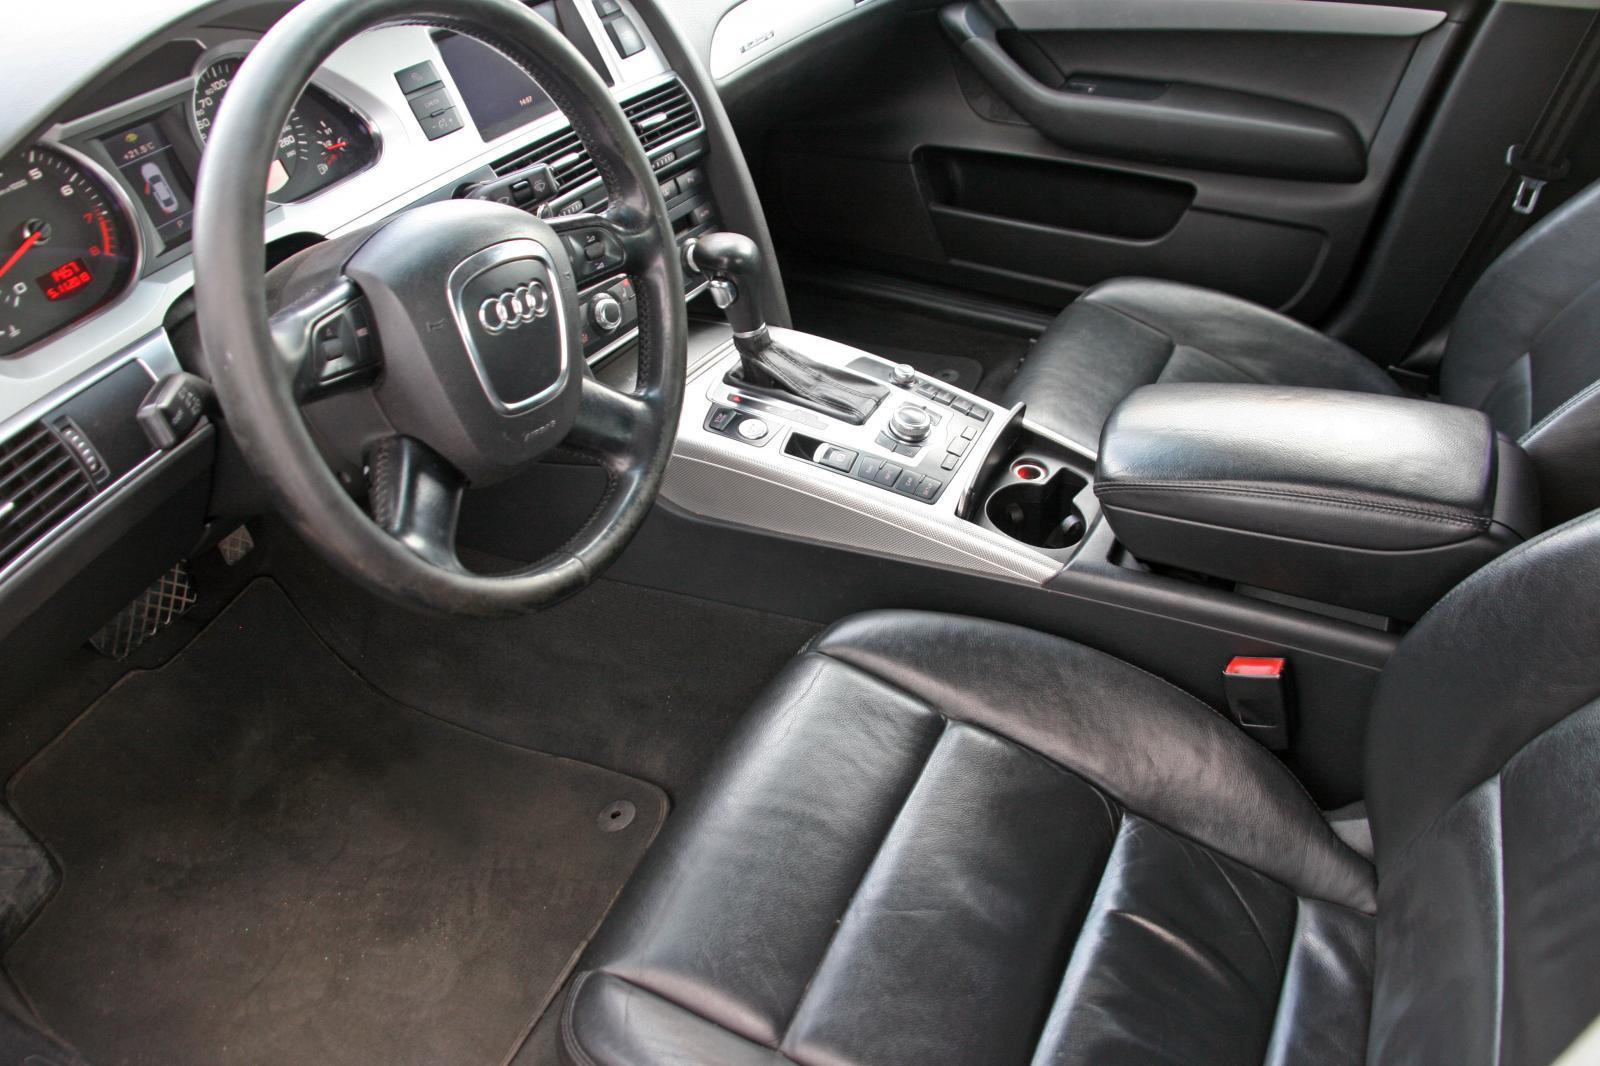 Audi A6, III (C6) Рестайлинг 2008г.